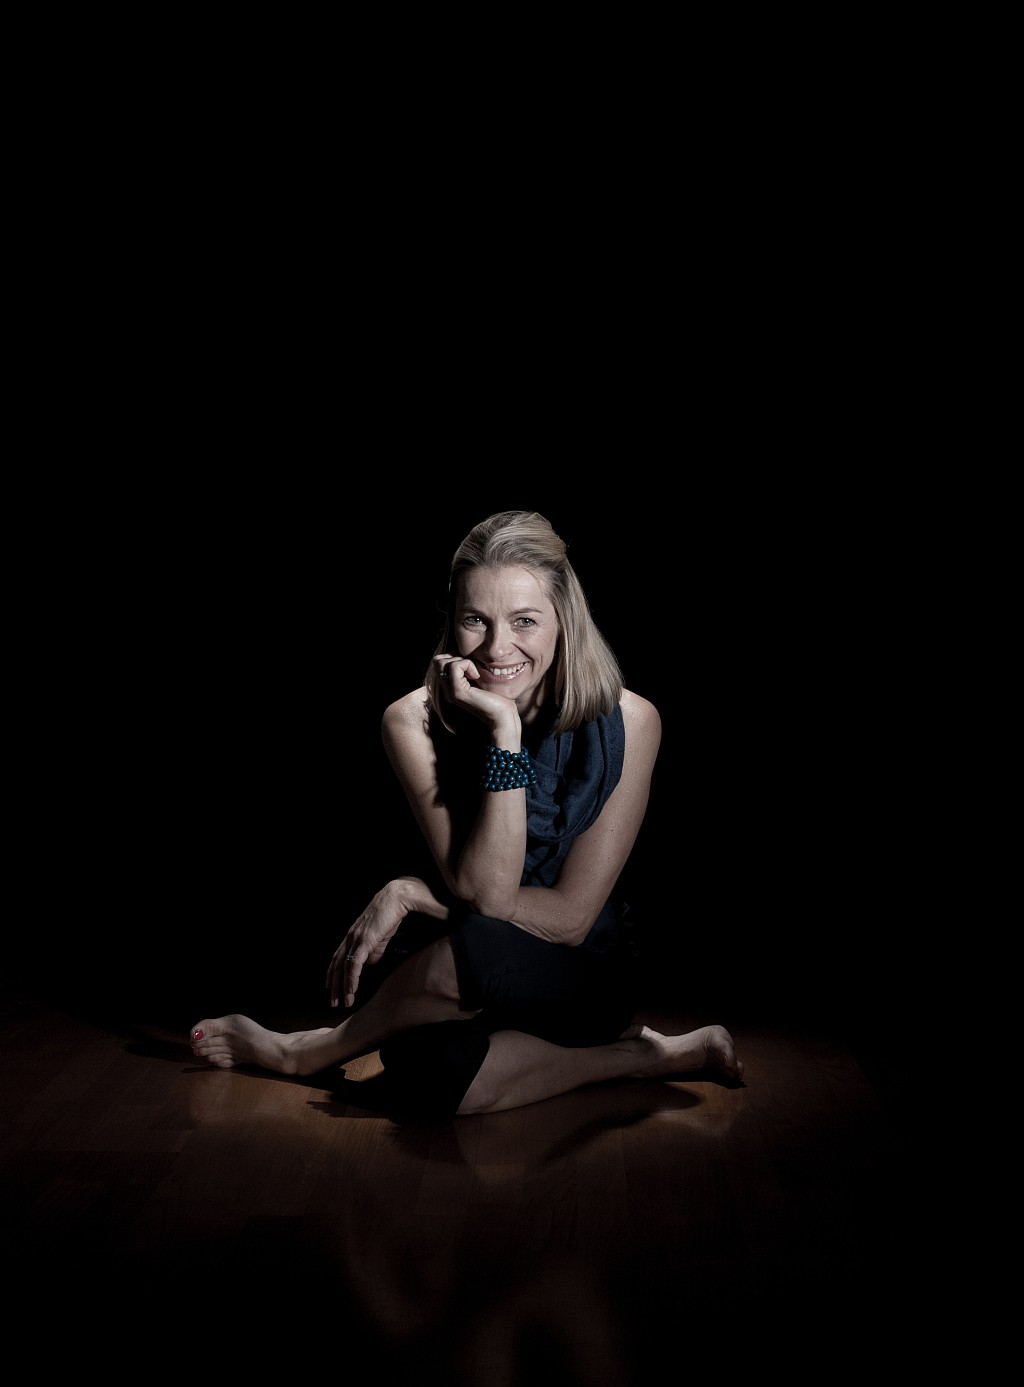 A-ROSA Kitzbühel Yoga Tania Wimmer